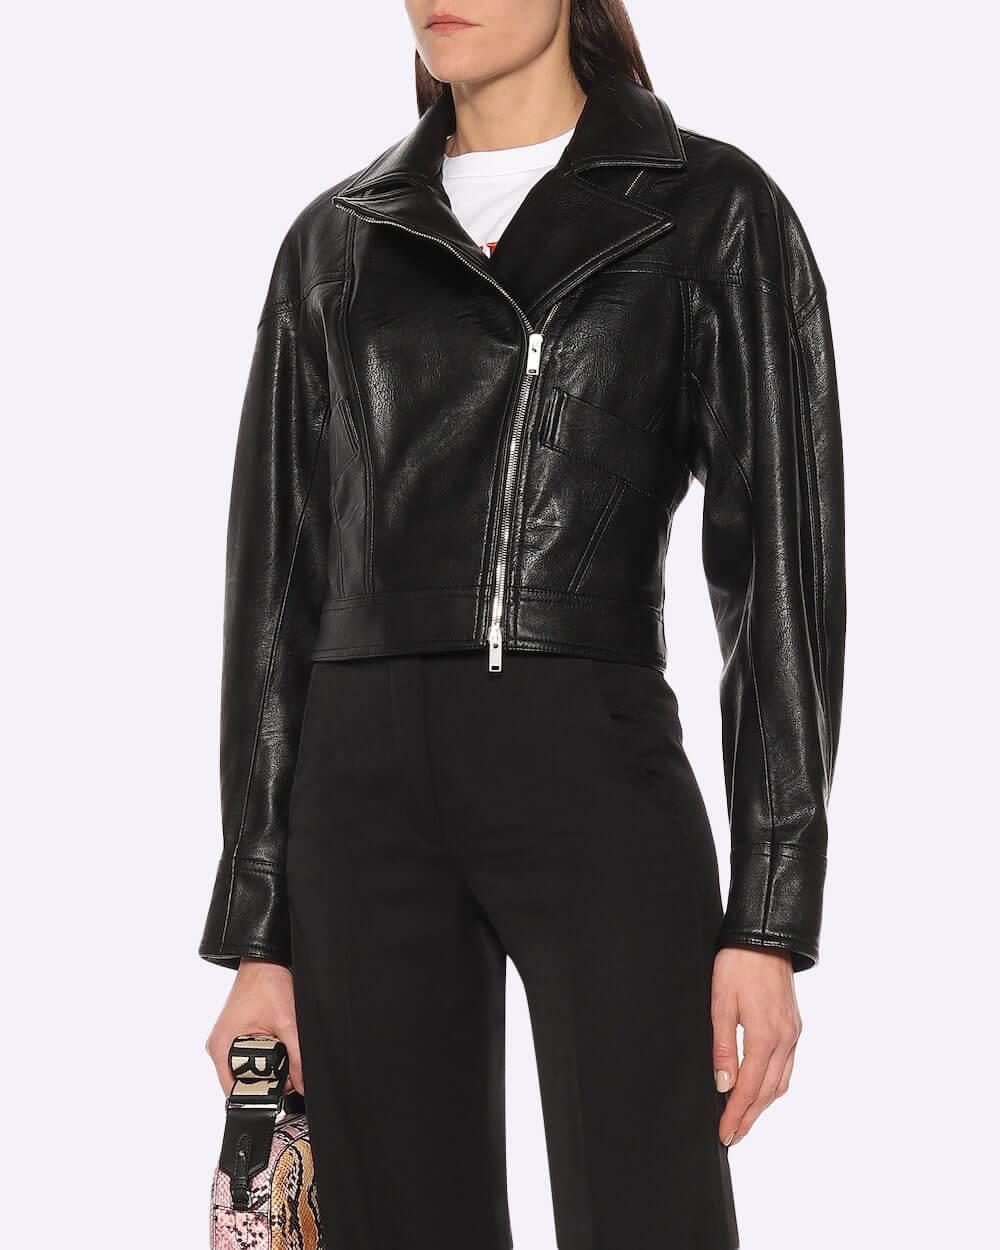 Stella McCartney vegan leather jacket with an asymmetric front zipper